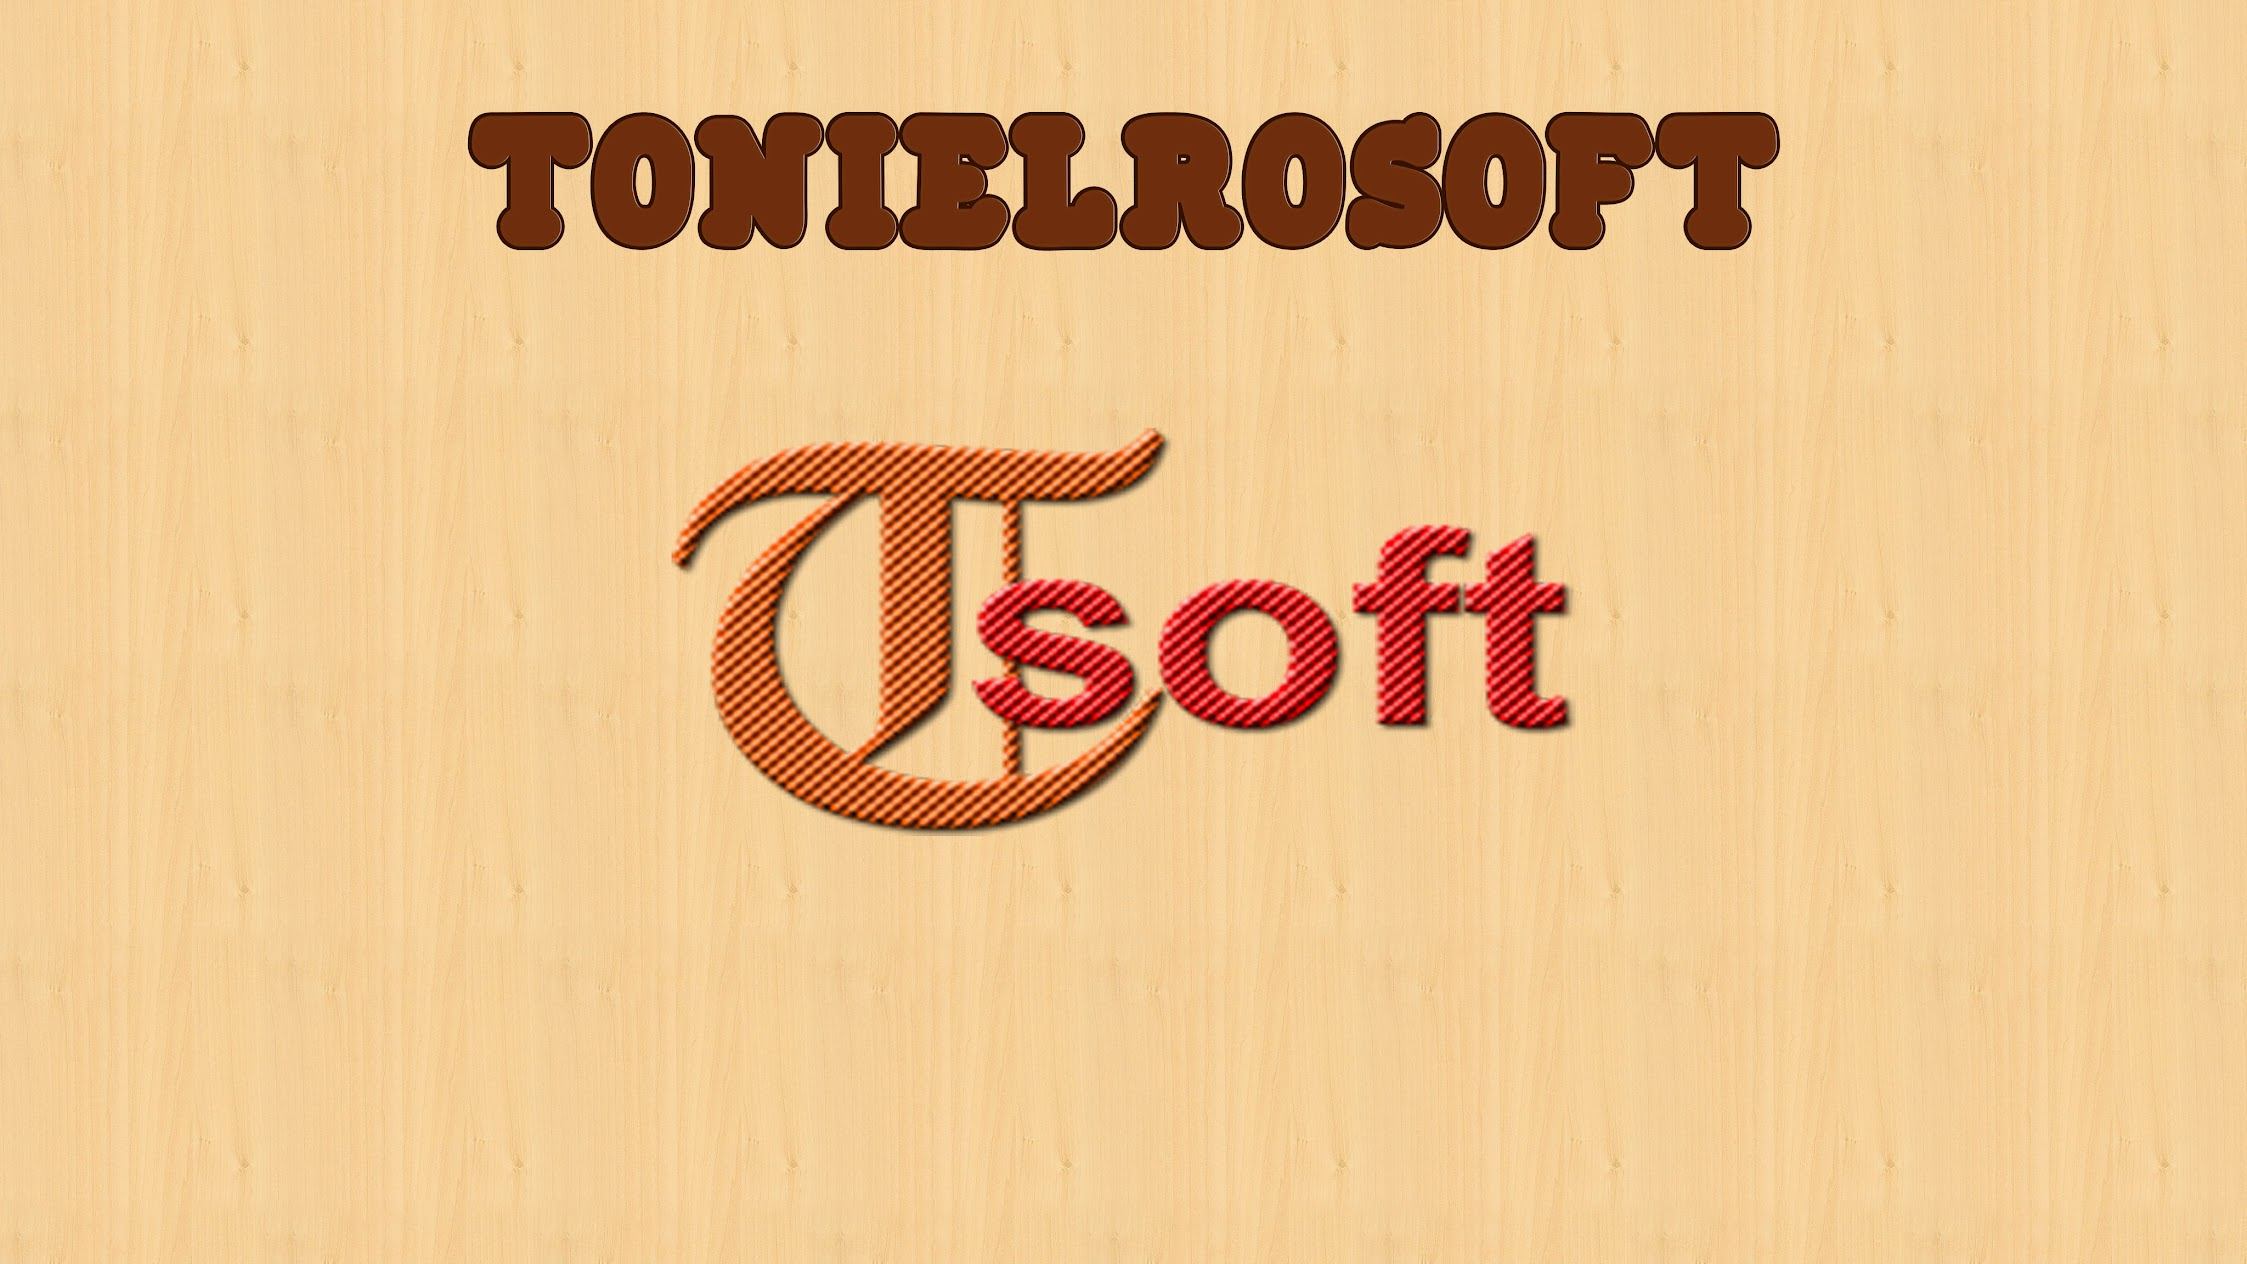 Tonielrosoft.